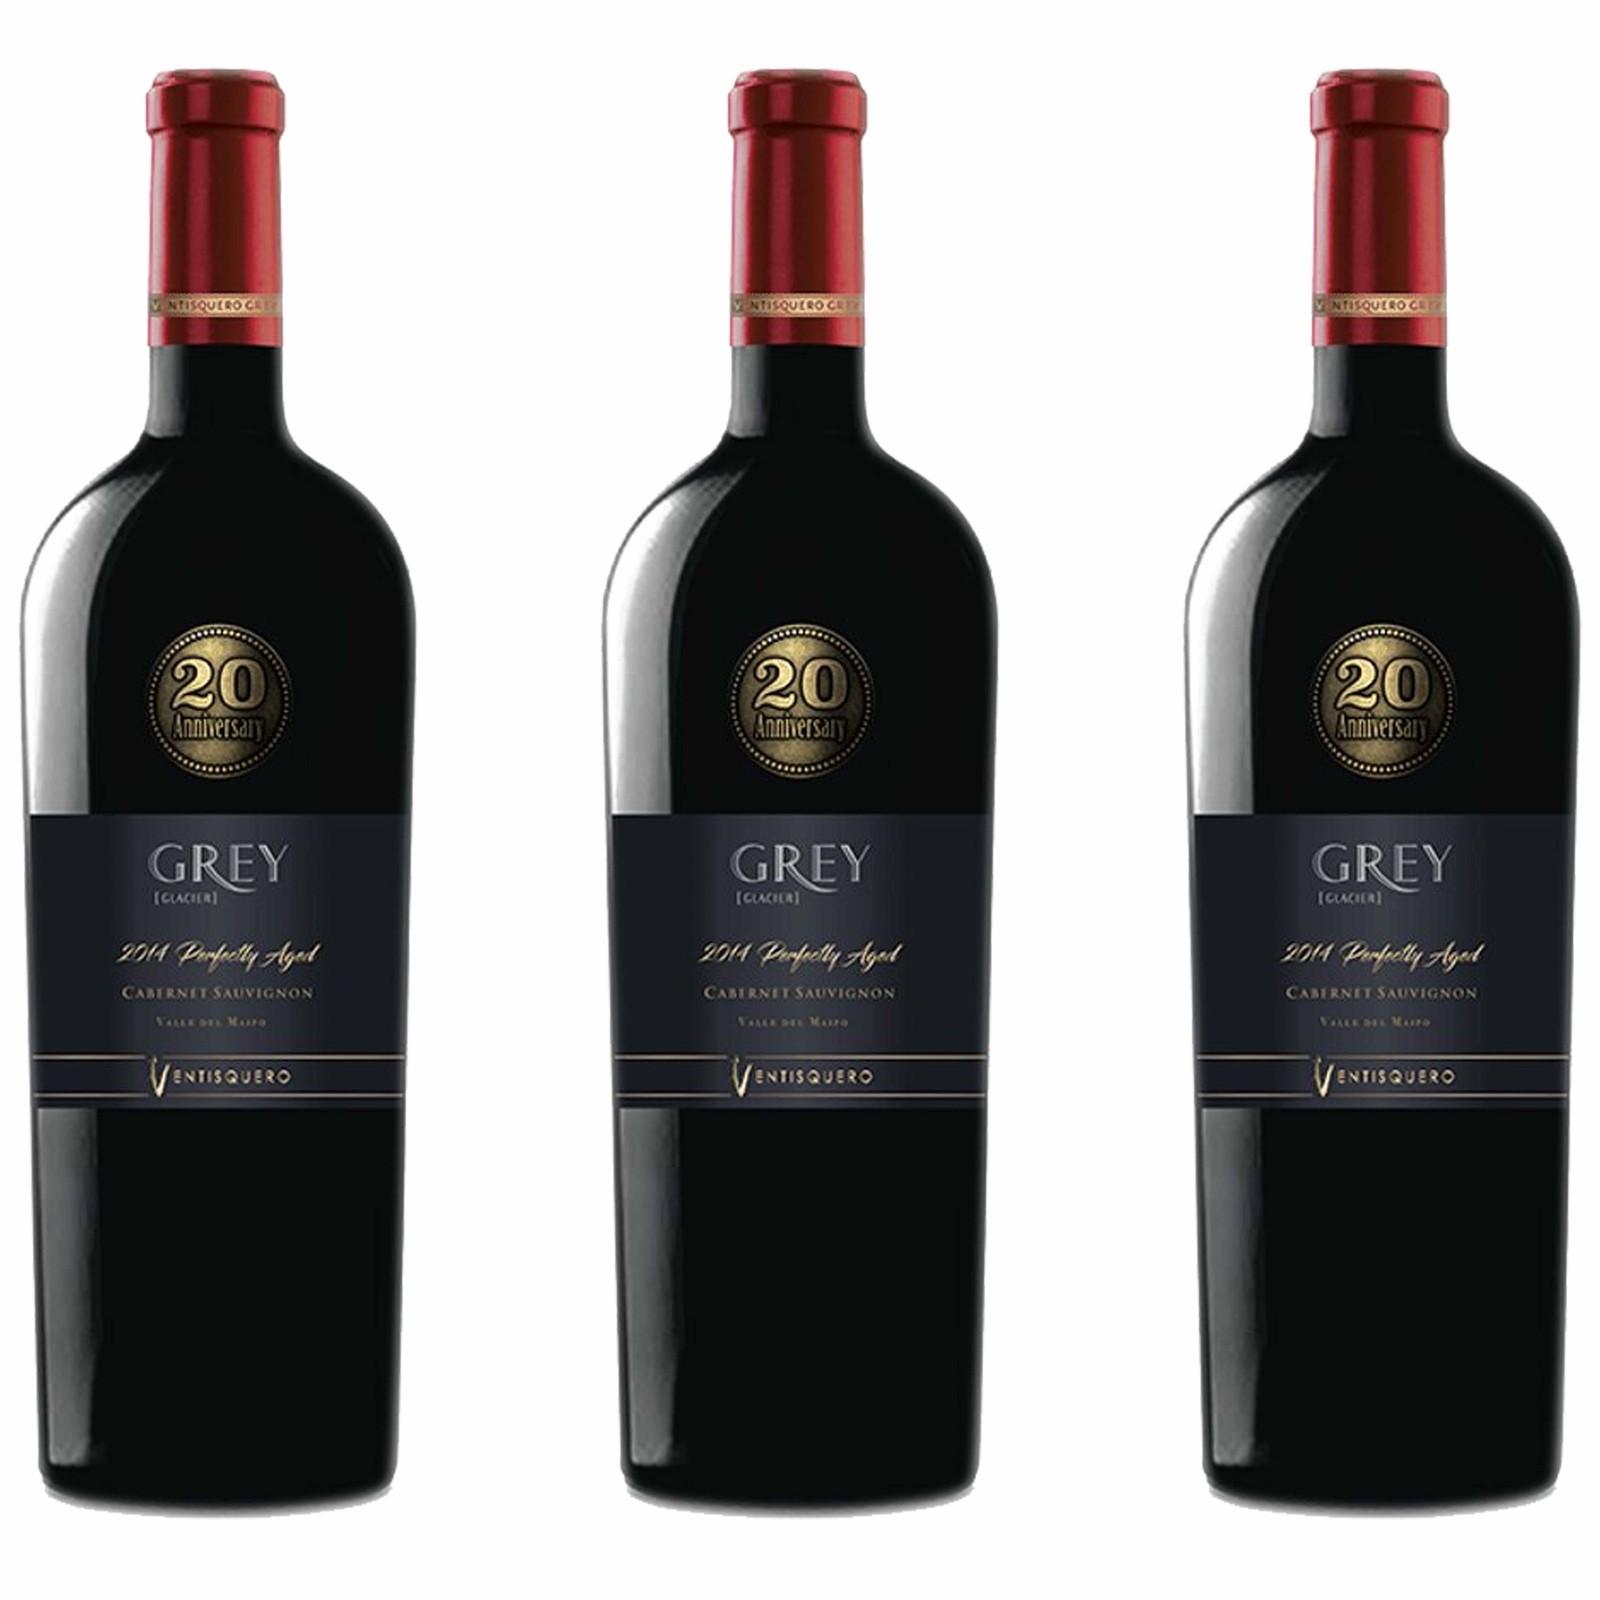 Kit 3x Vinho Tinto Chileno Ventisquero Grey Special Edition Cabernet Sauvignon 2014 750ml